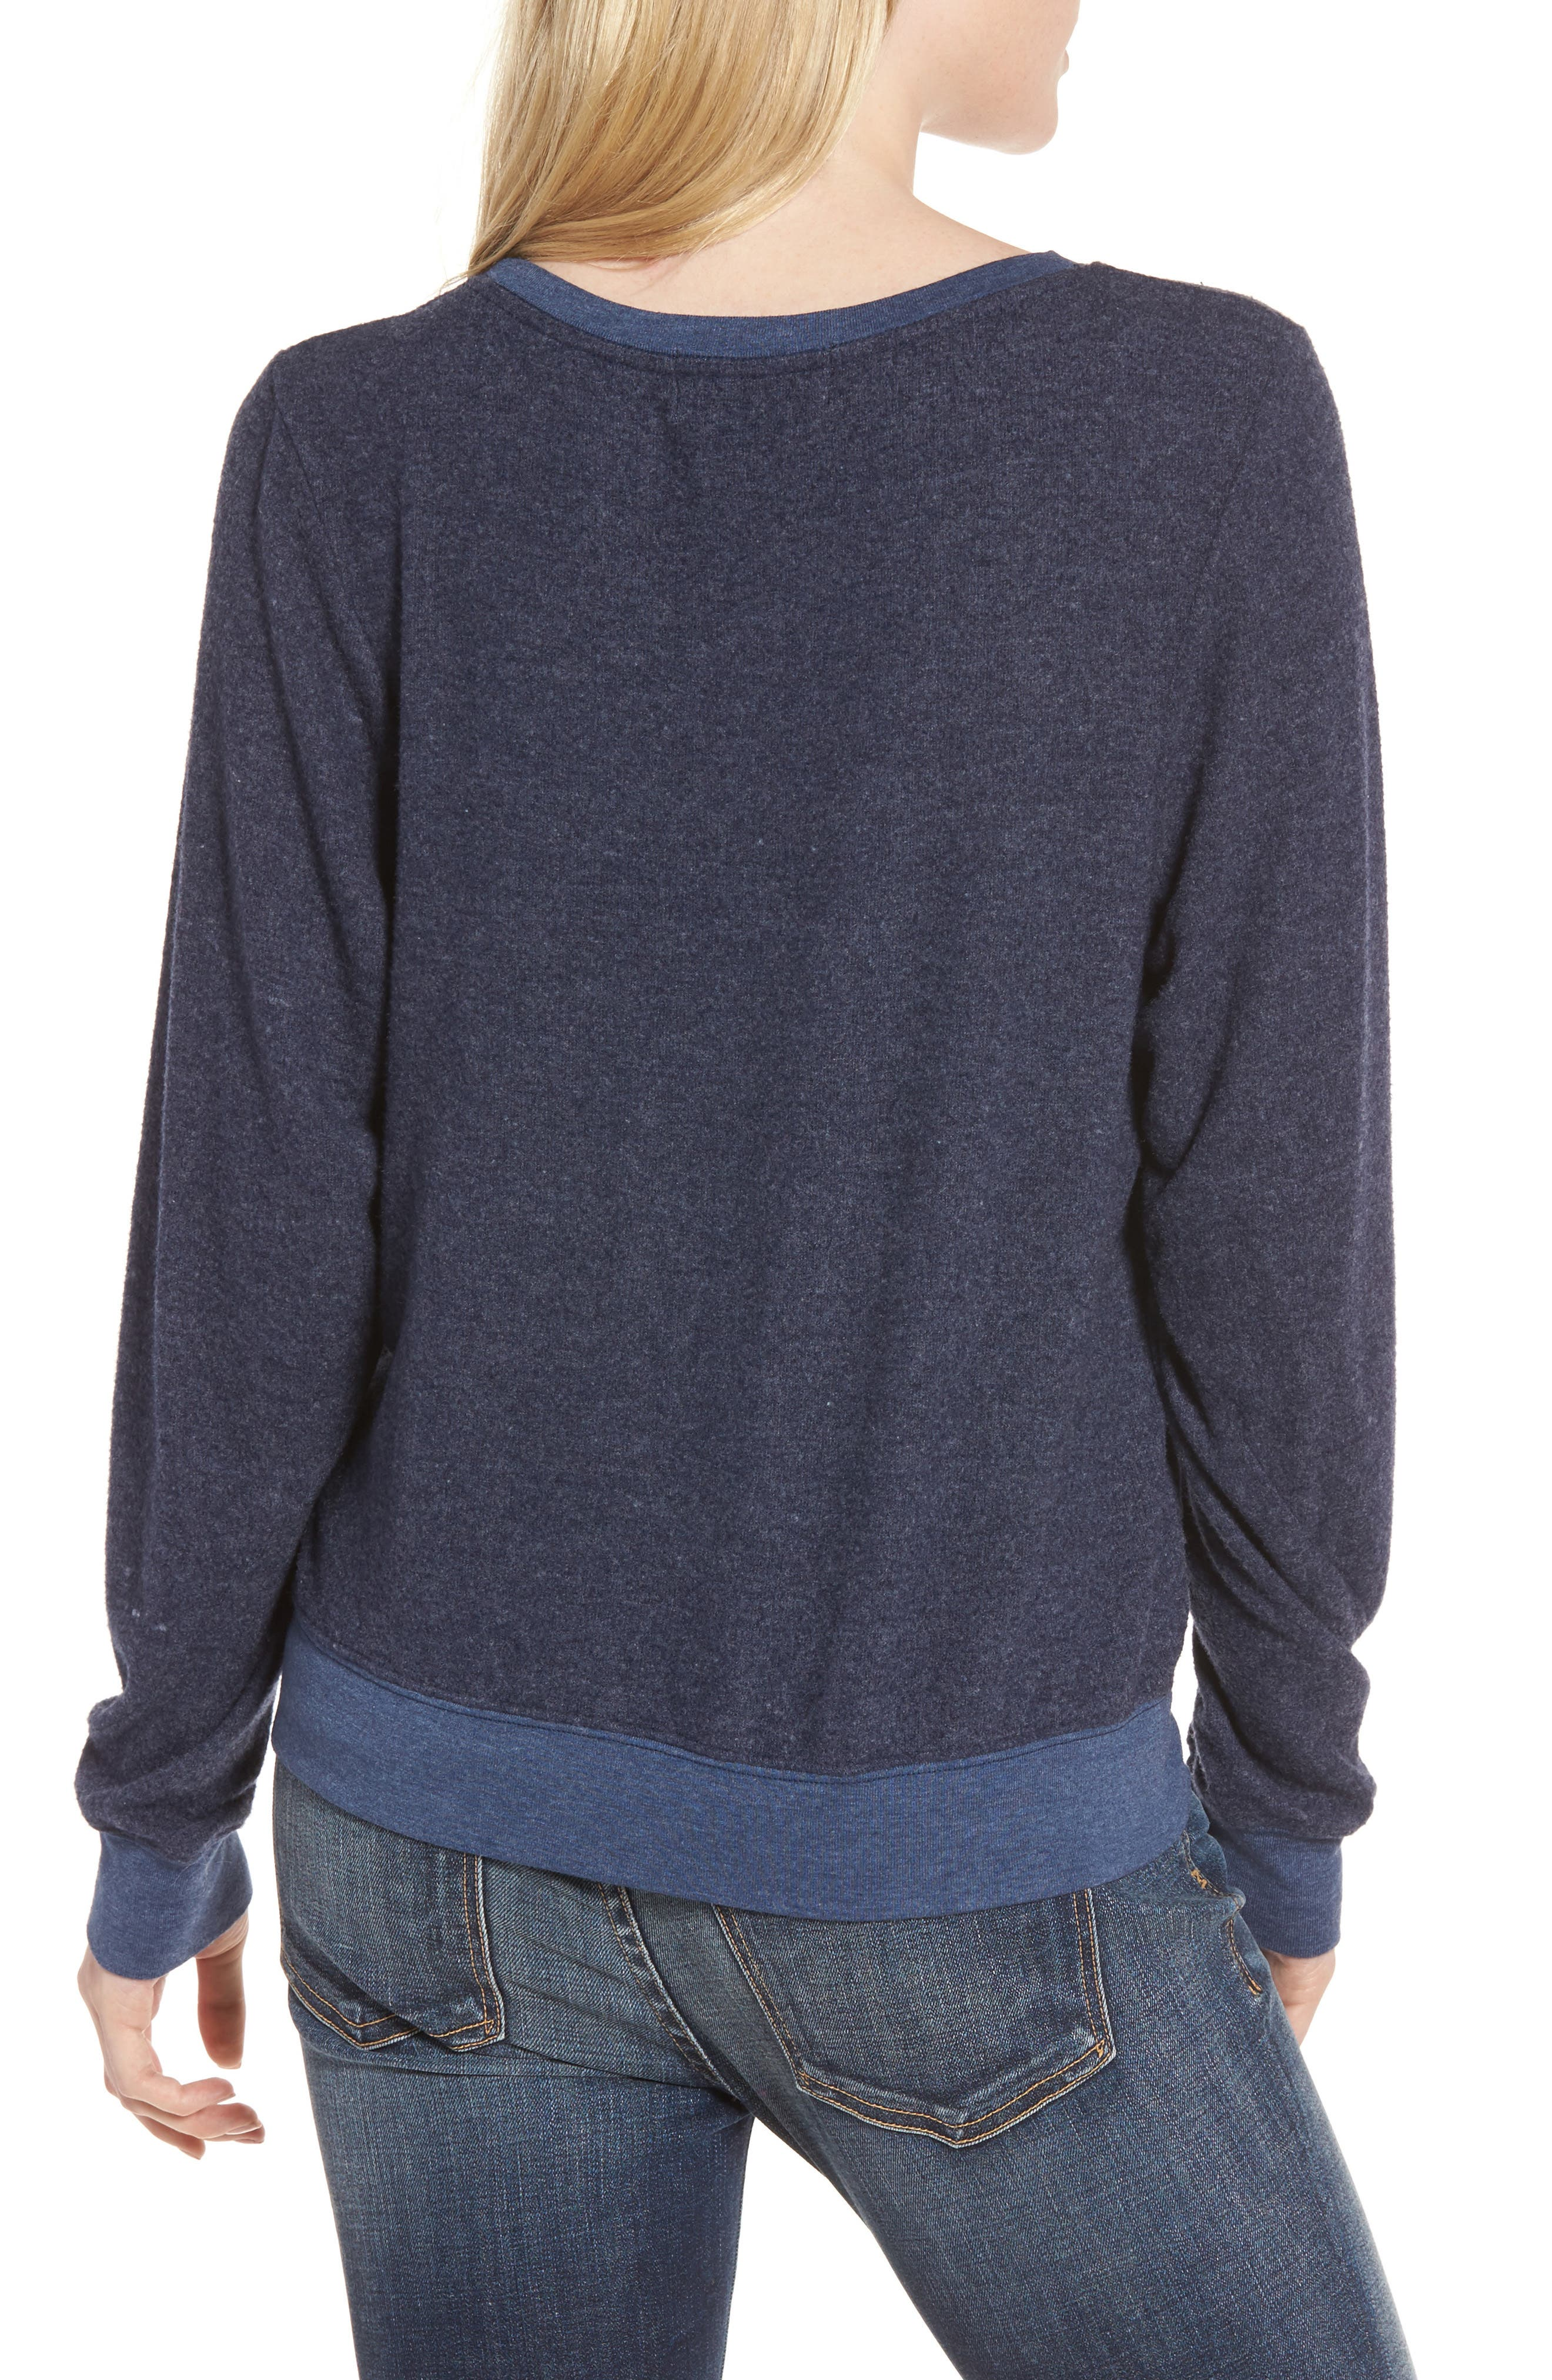 Yes, Please Sweatshirt,                             Alternate thumbnail 2, color,                             401